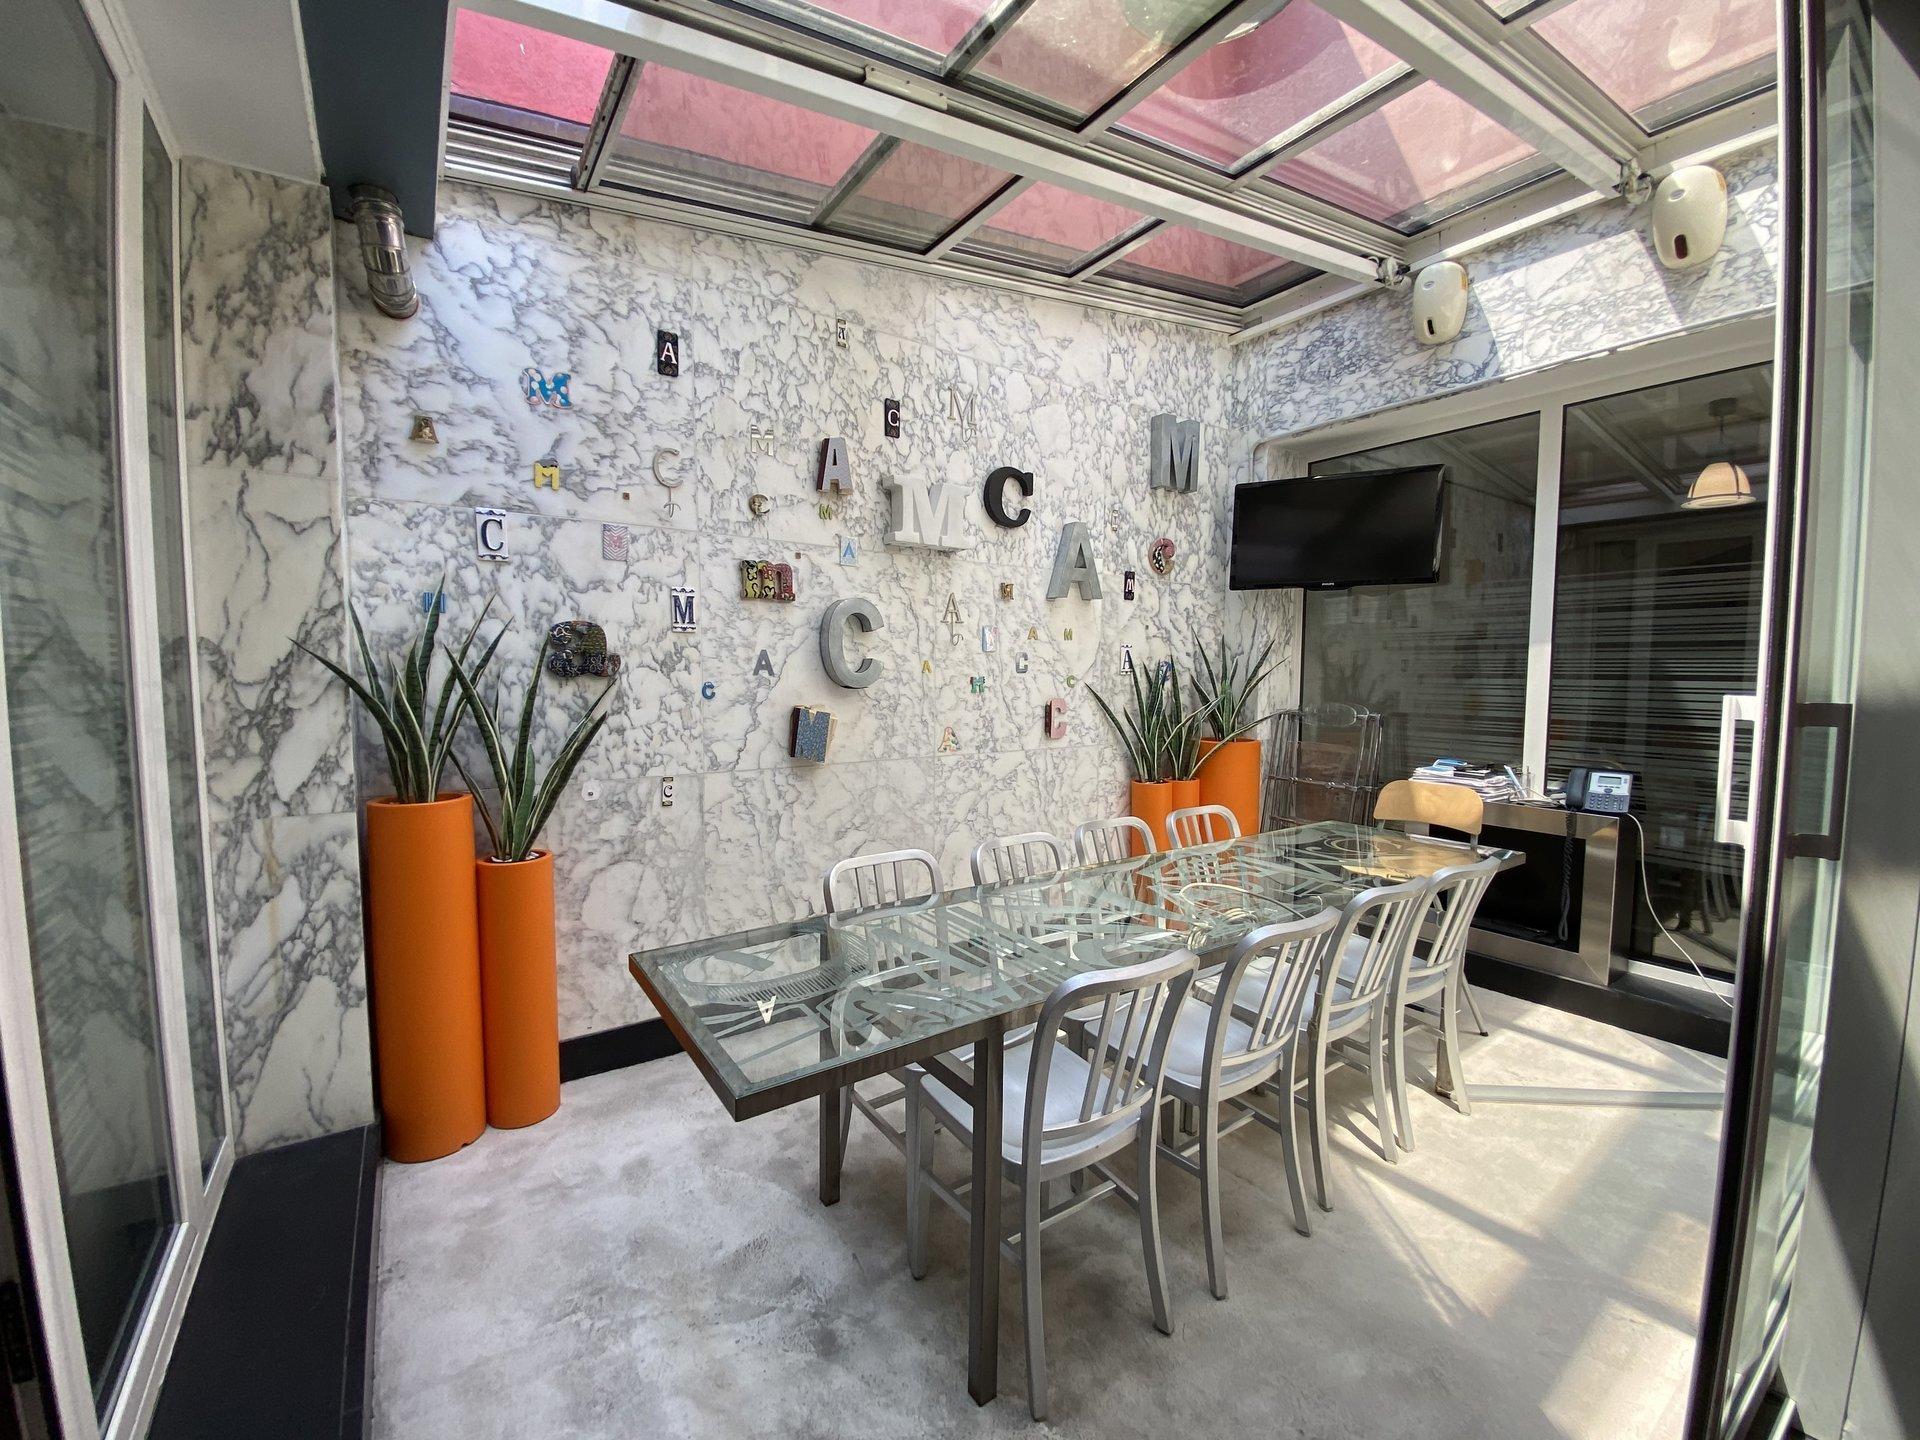 Milano - Via A. Binda 34: Splendido  Loft su due livelli 250 mq